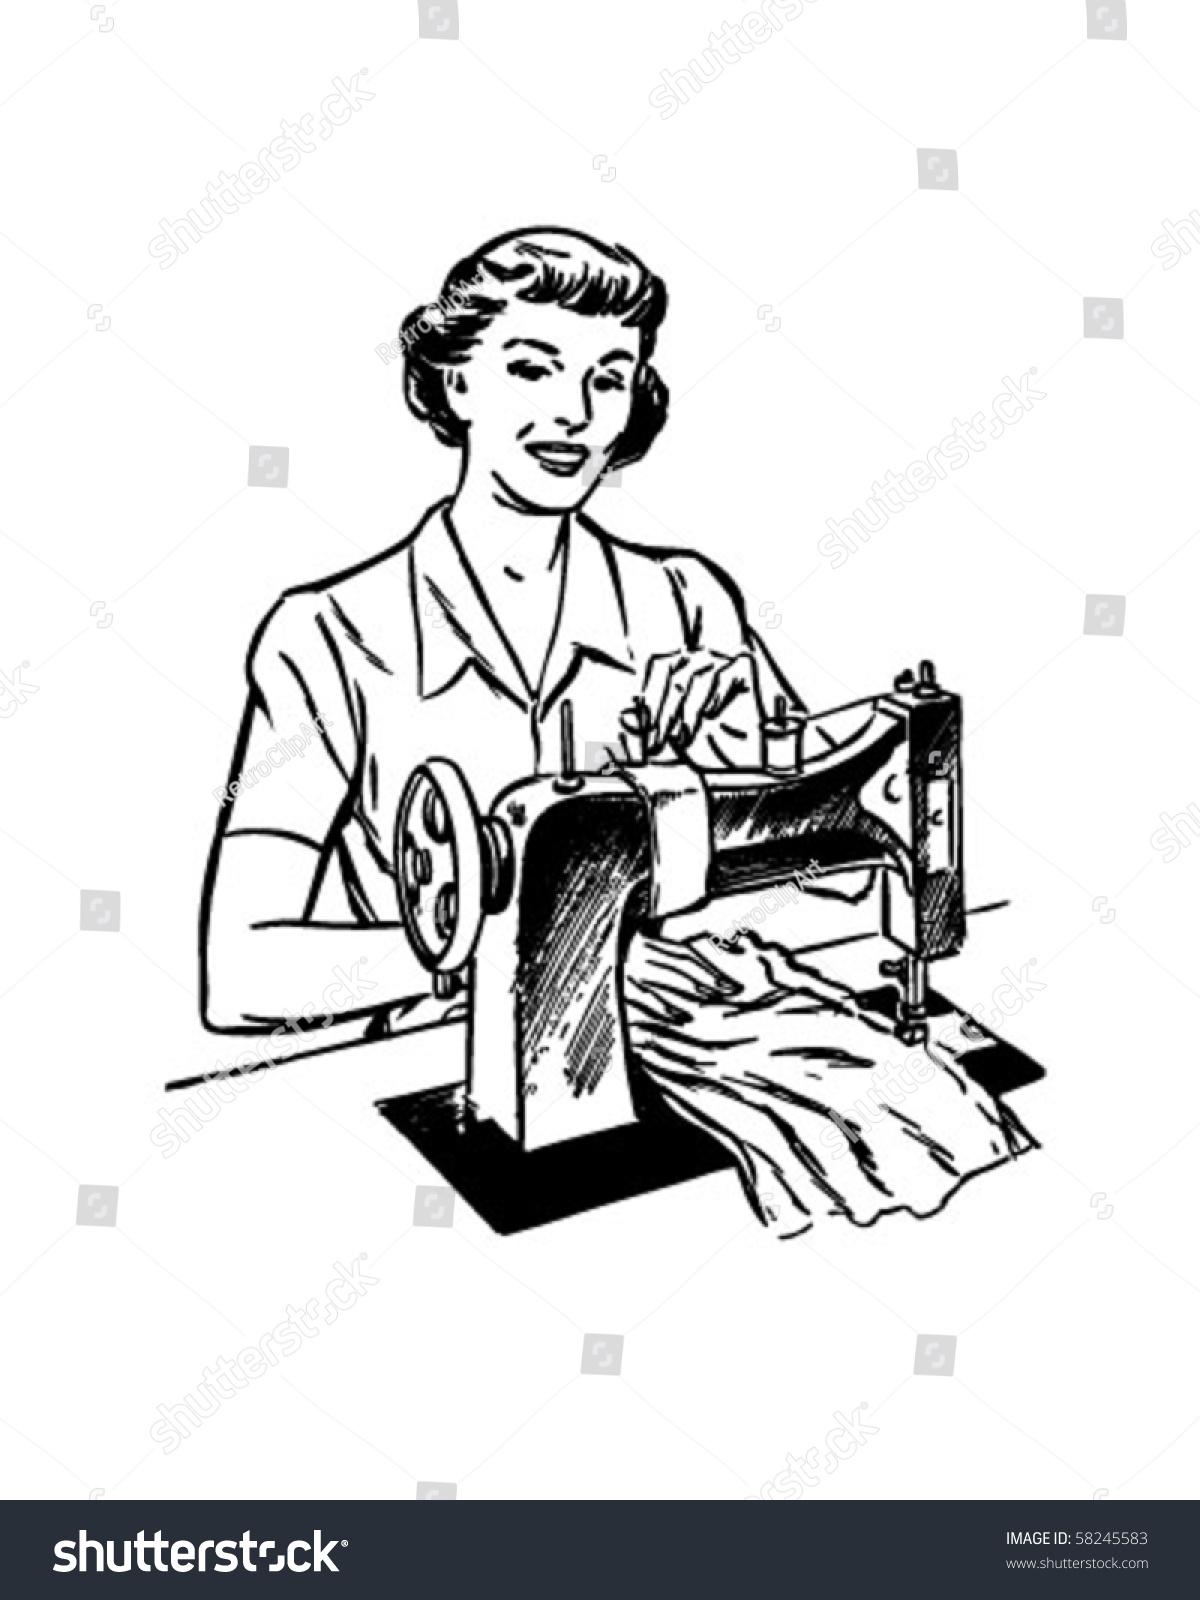 Lady Sewing Retro Clip Art Stock Vector 58245583 - Shutterstock